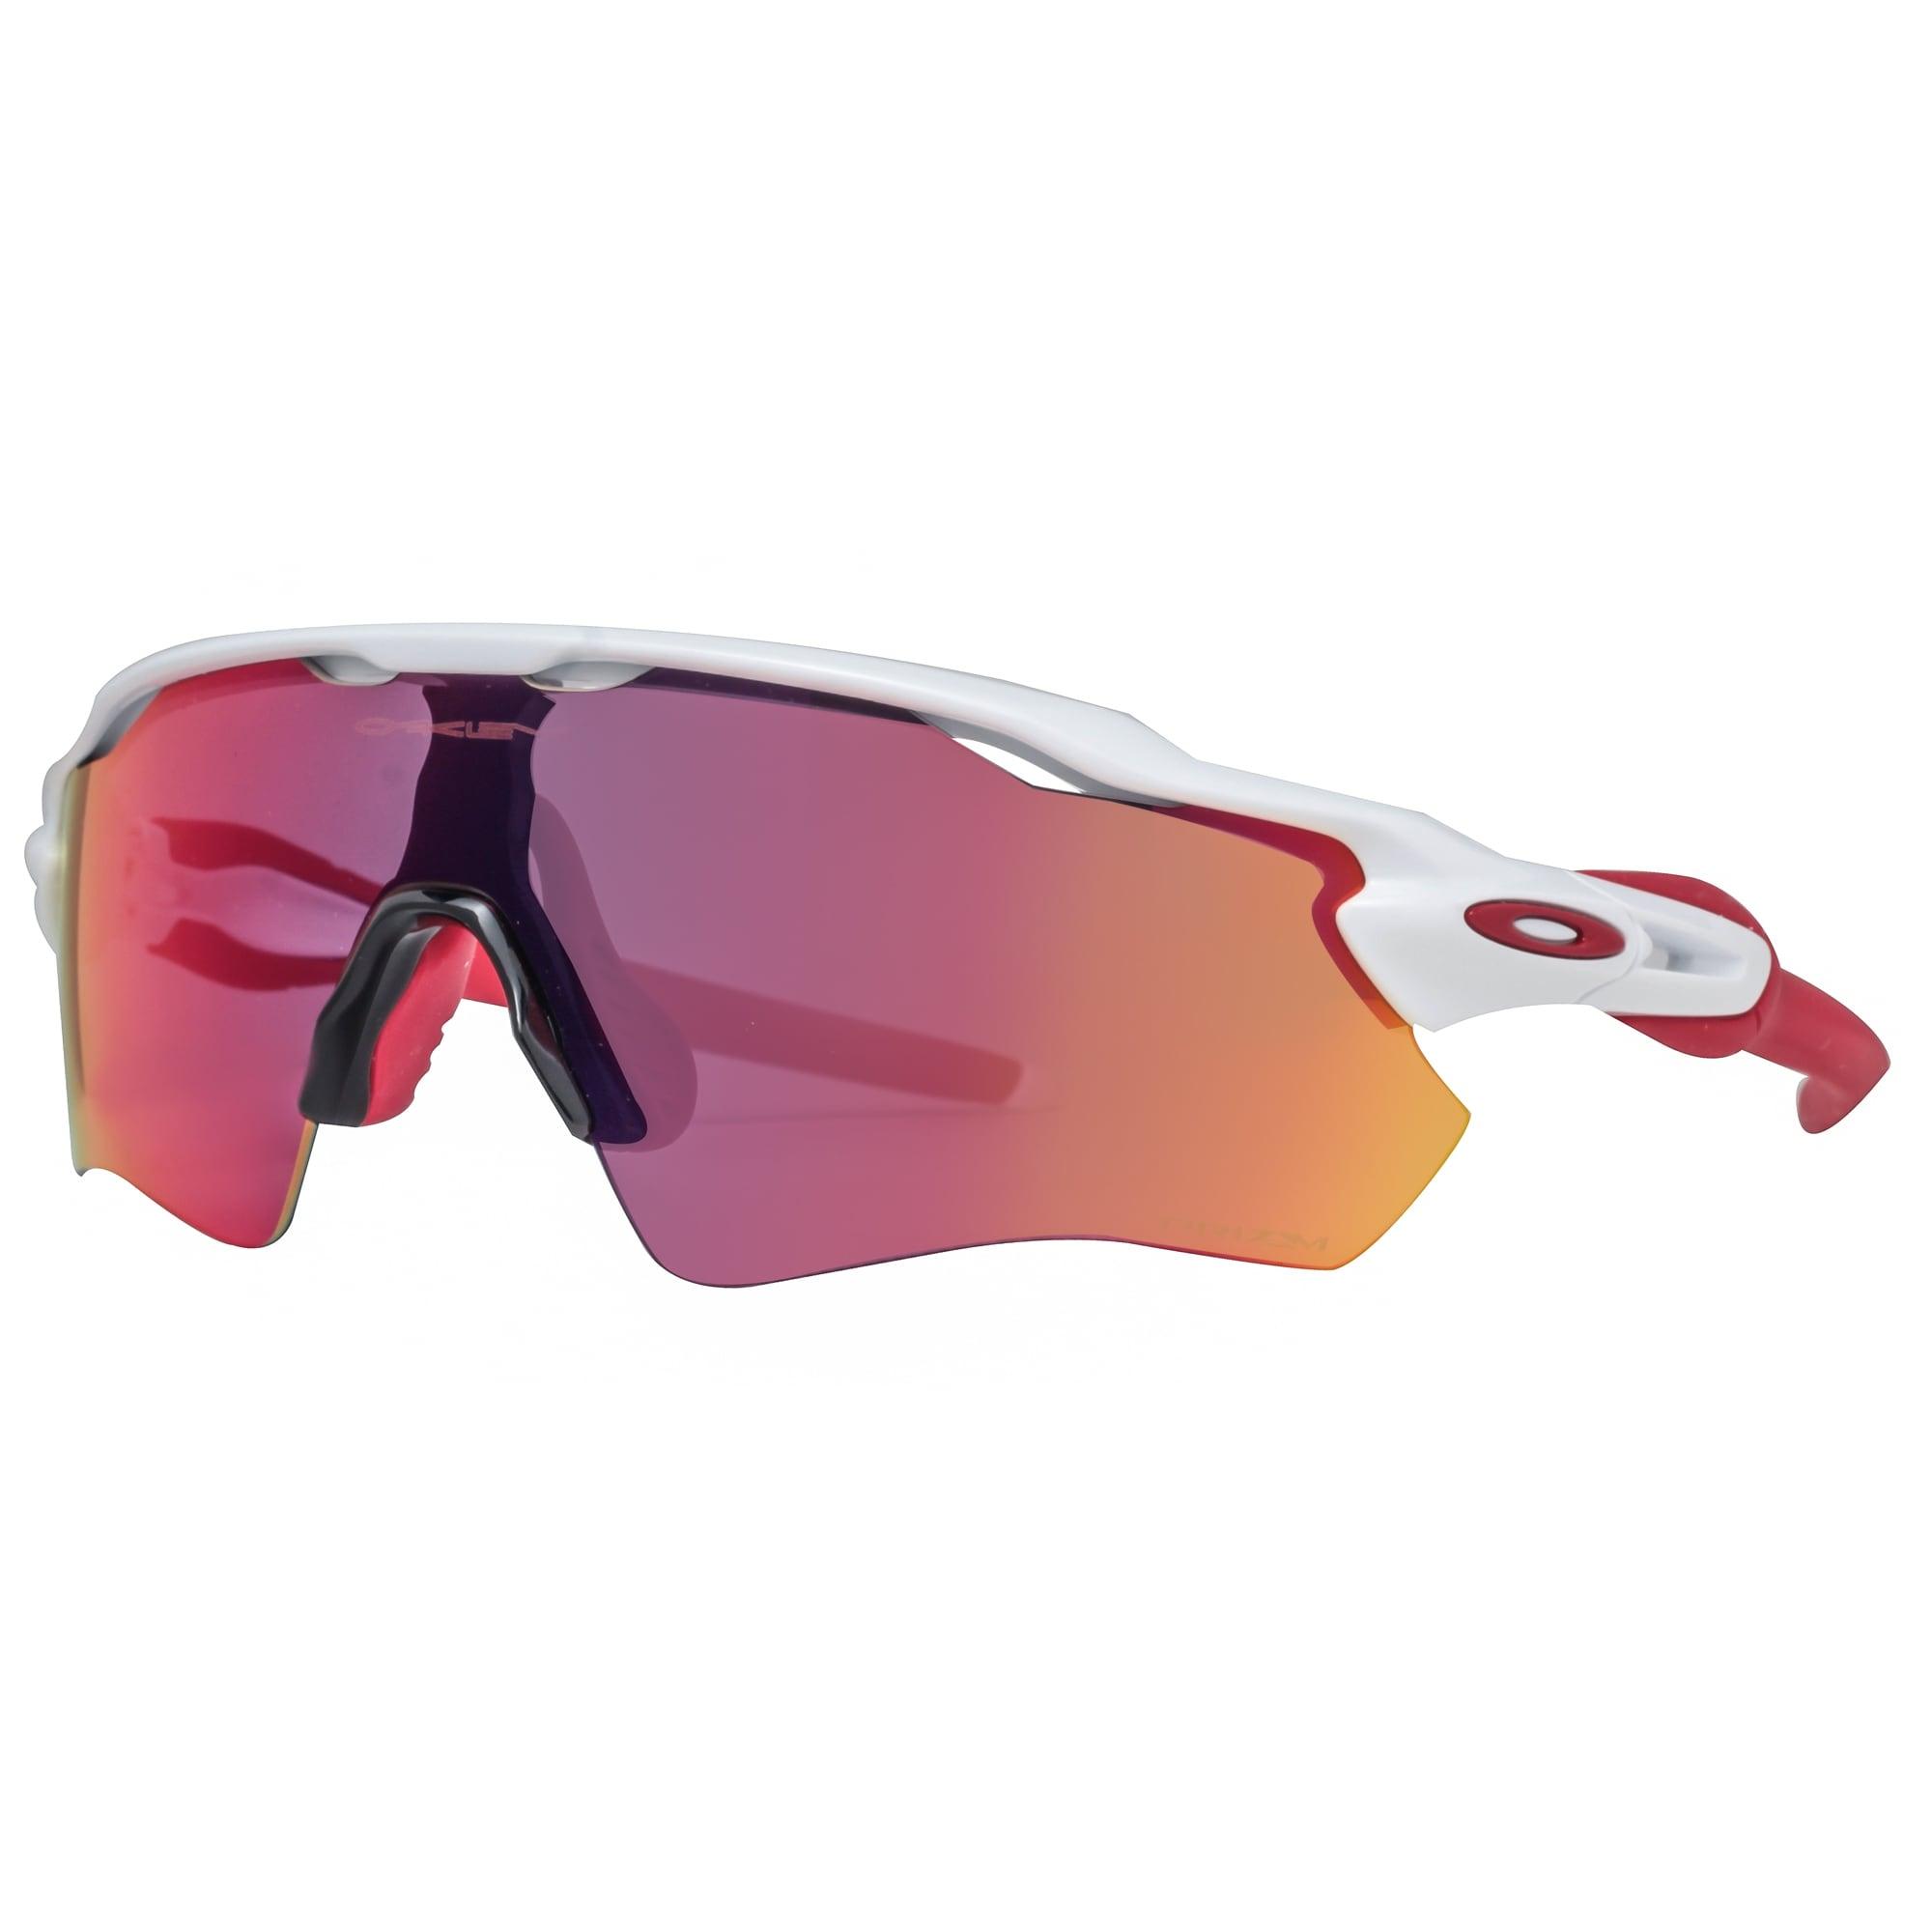 1ef7a4c49aa low price shop oakley radar ev path oo9208 05 polished white red prizm road  shield sunglasses